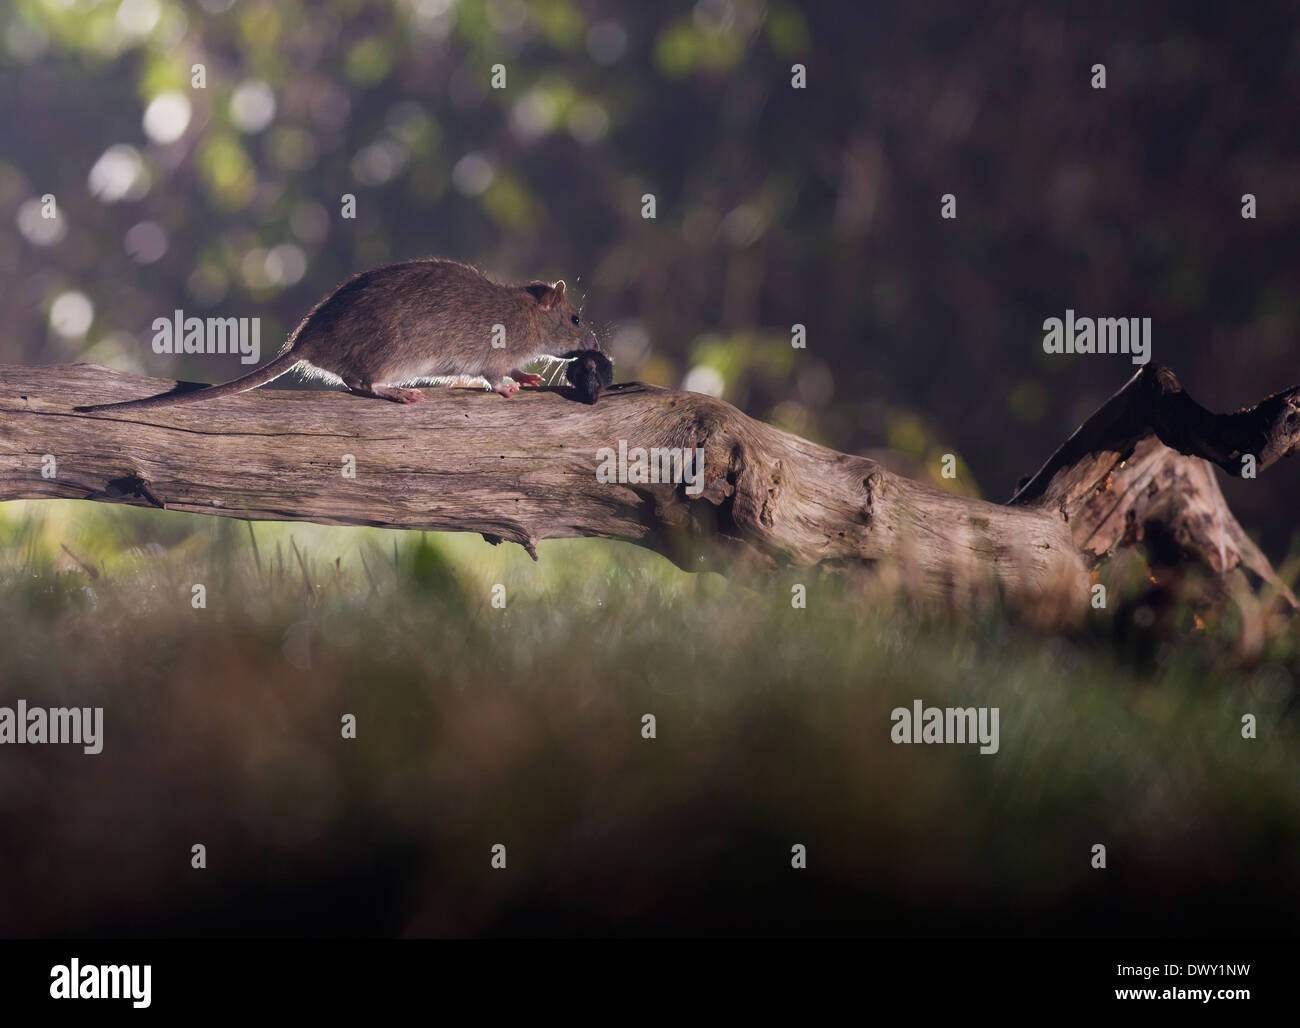 Brown Rat (Rattus norvegicus) on fallen tree branch at night - Stock Image